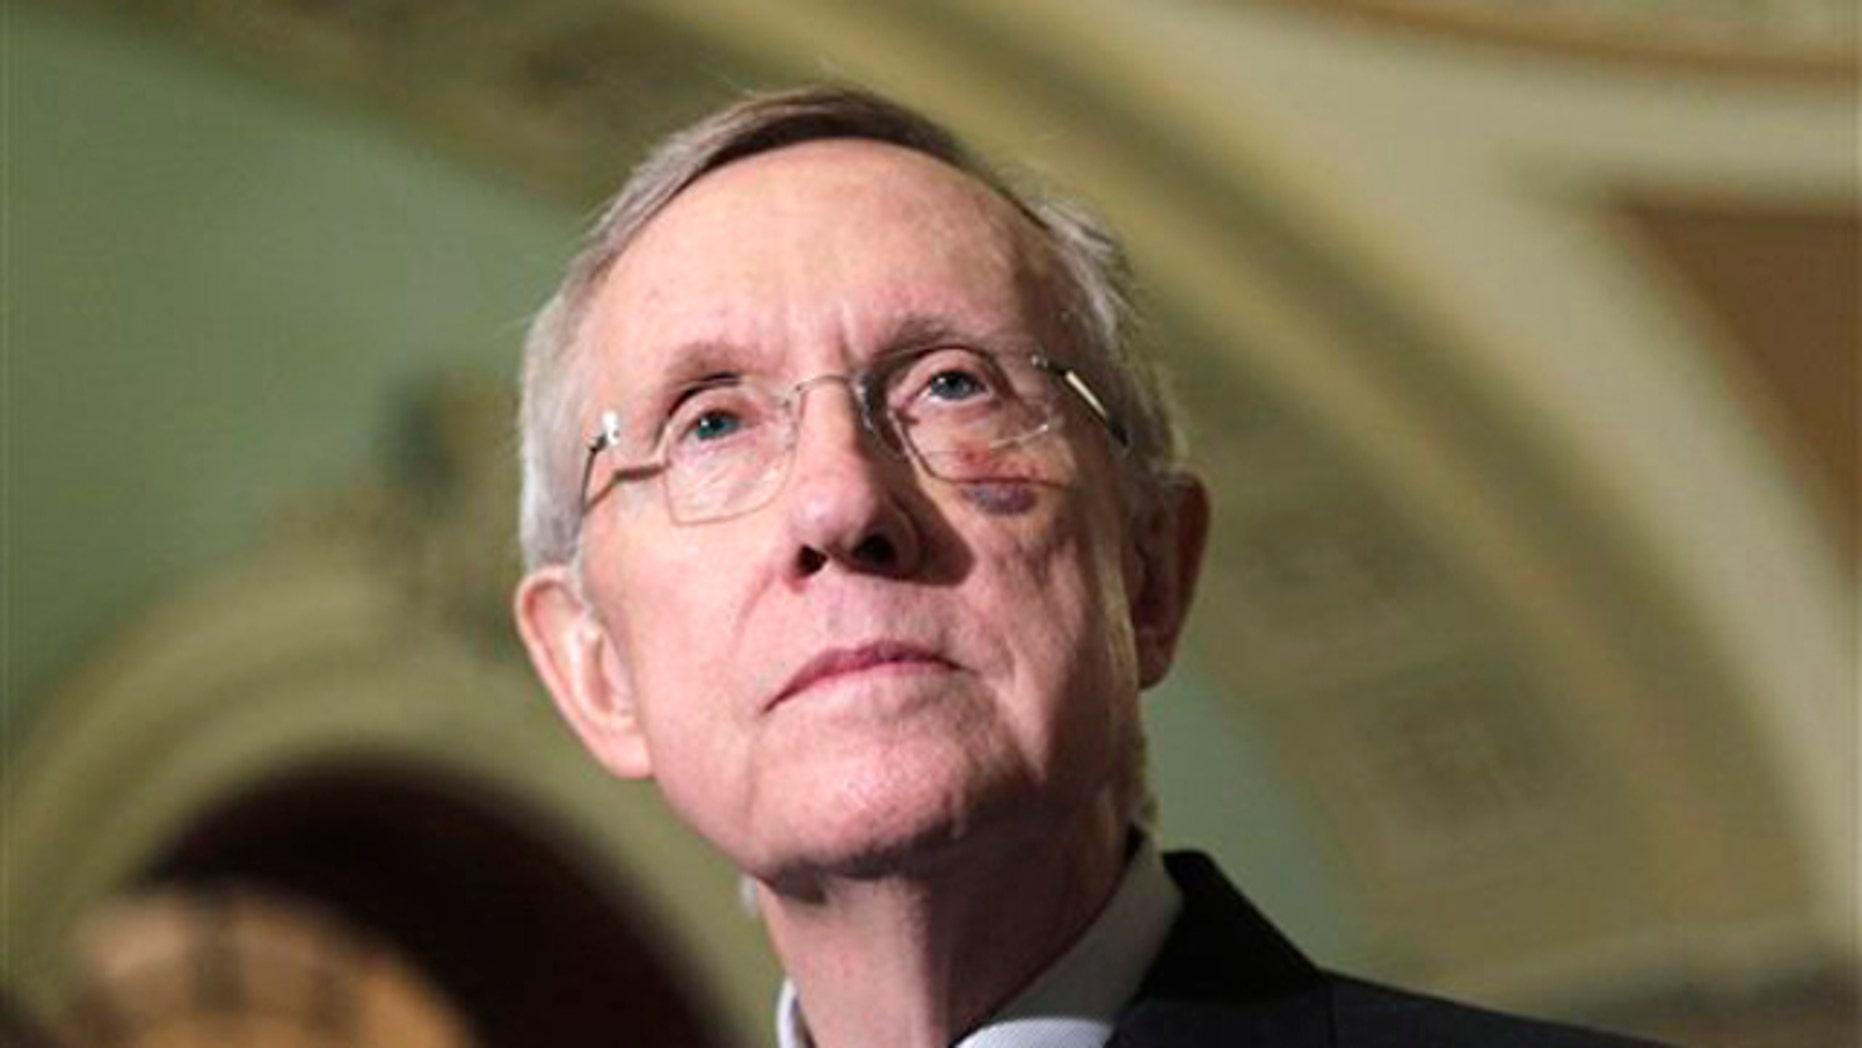 Senate Majority Leader Harry Reid speaks to reporters on Capitol Hill in Washington May 24.